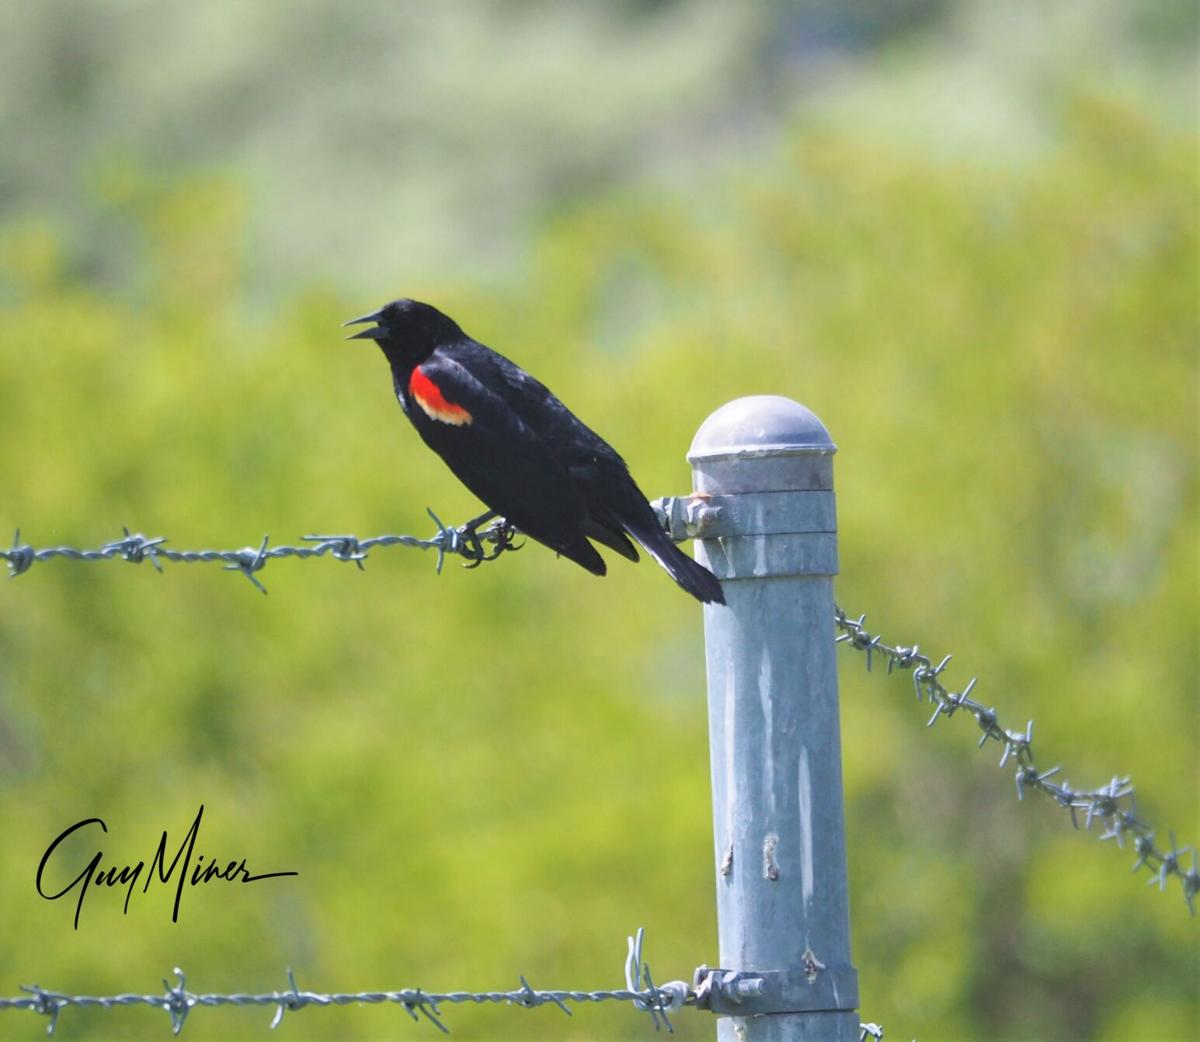 guy_miner_bird.JPG